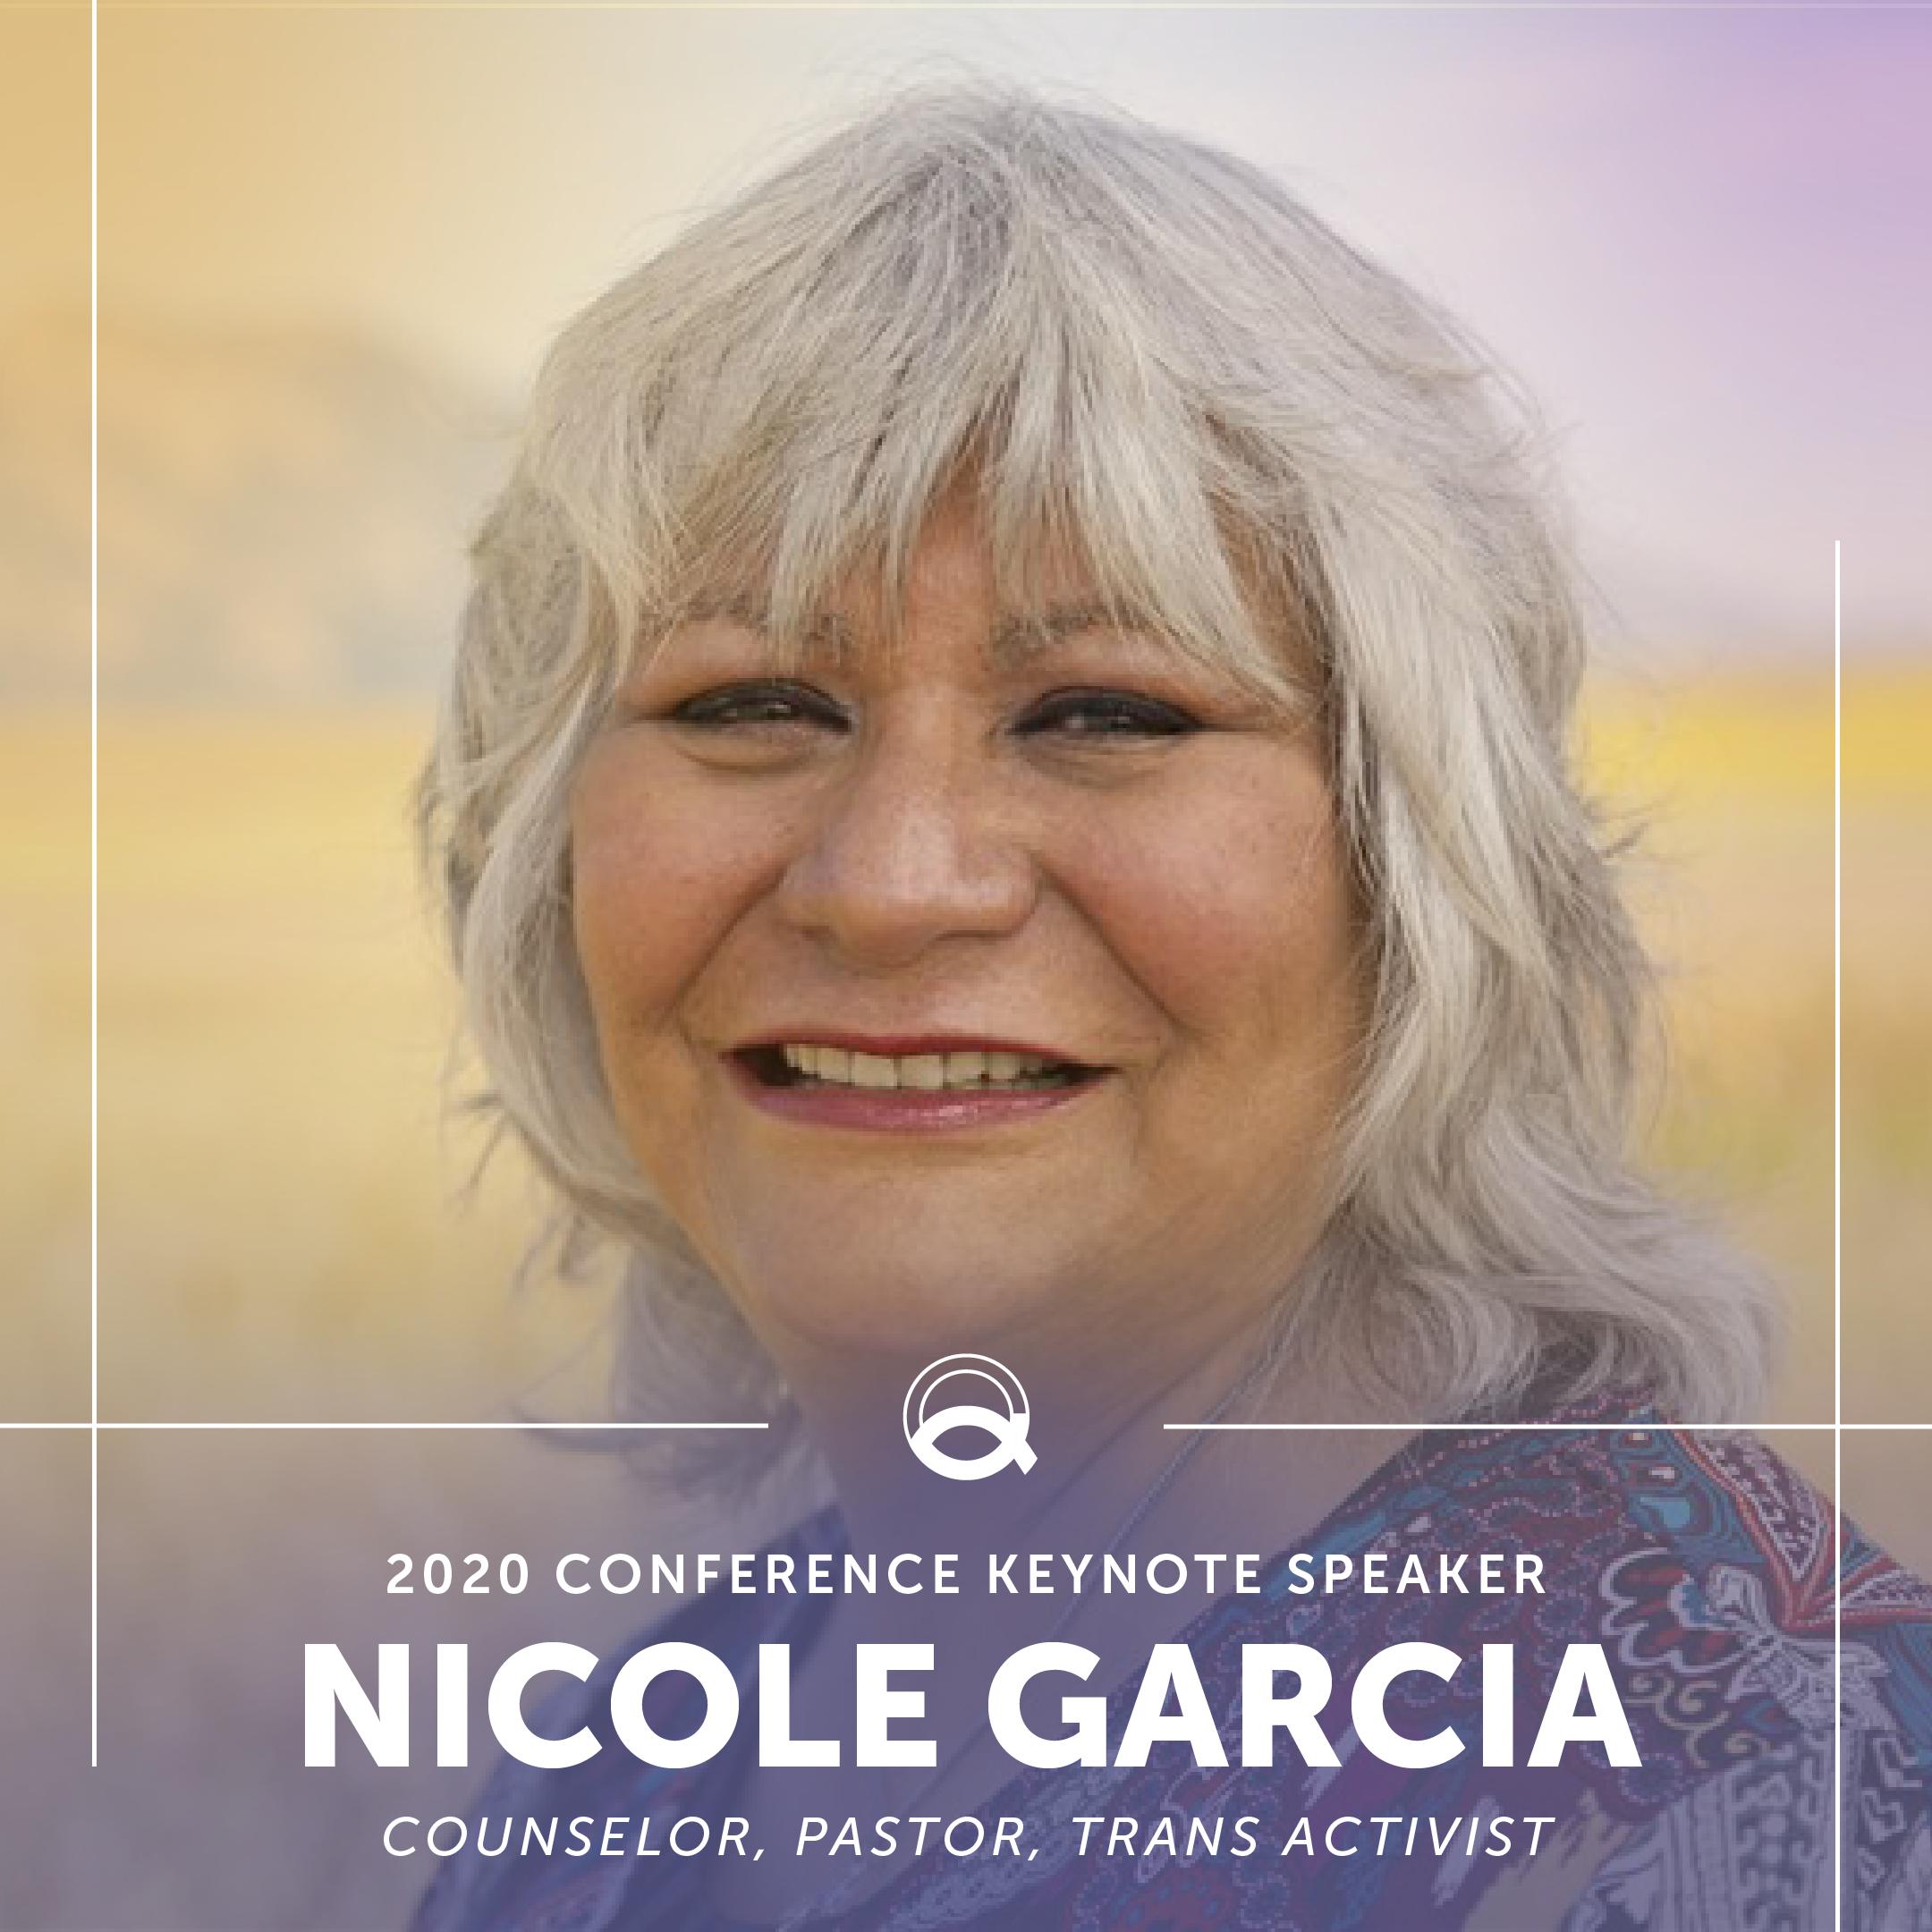 QCF – Conference – Nicole Garcia AnnouncementInstagram@2x (1).png